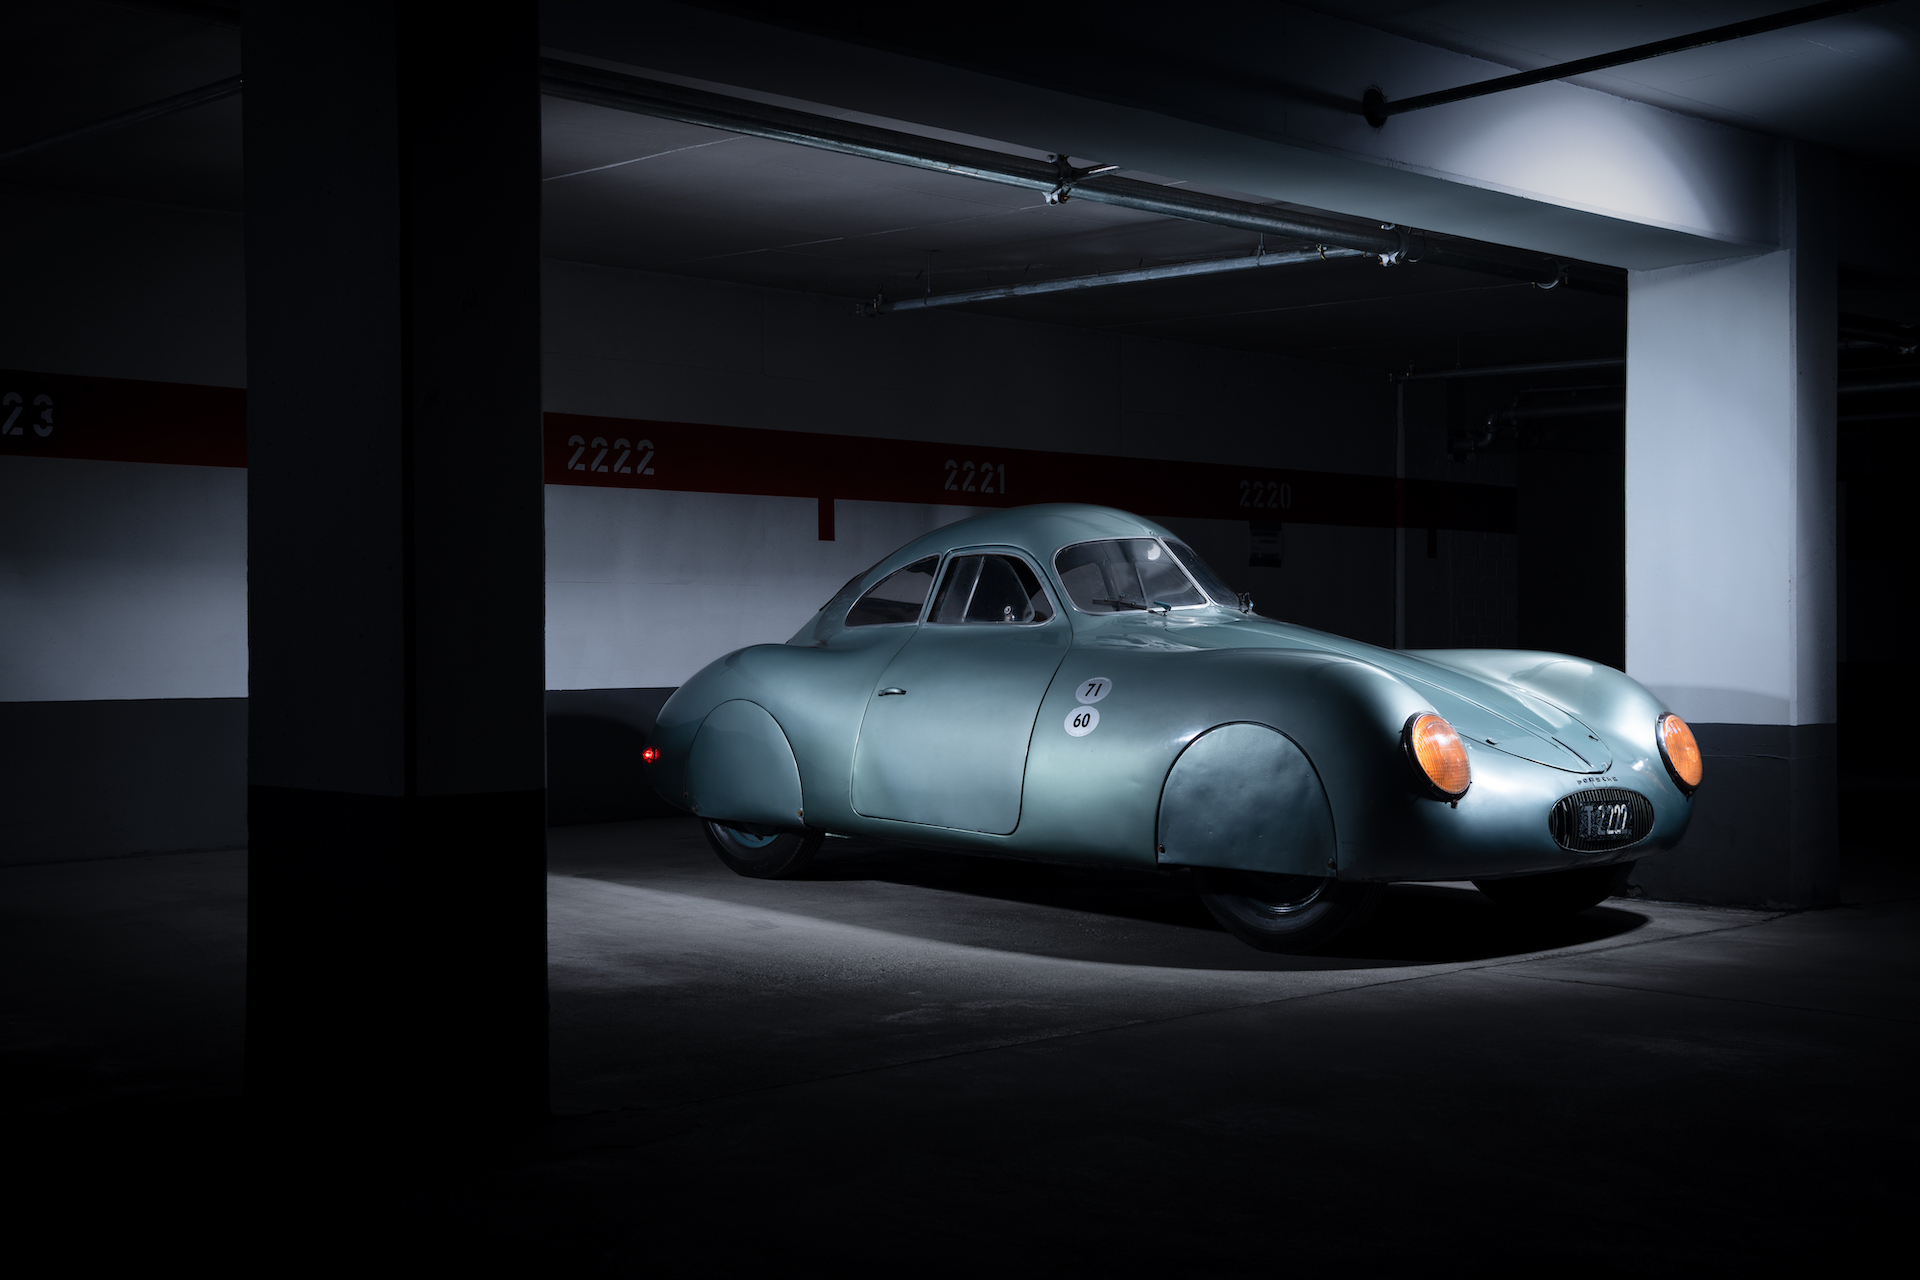 Porsche Type 64 - The Oldest Car to wear the Porsche Badge